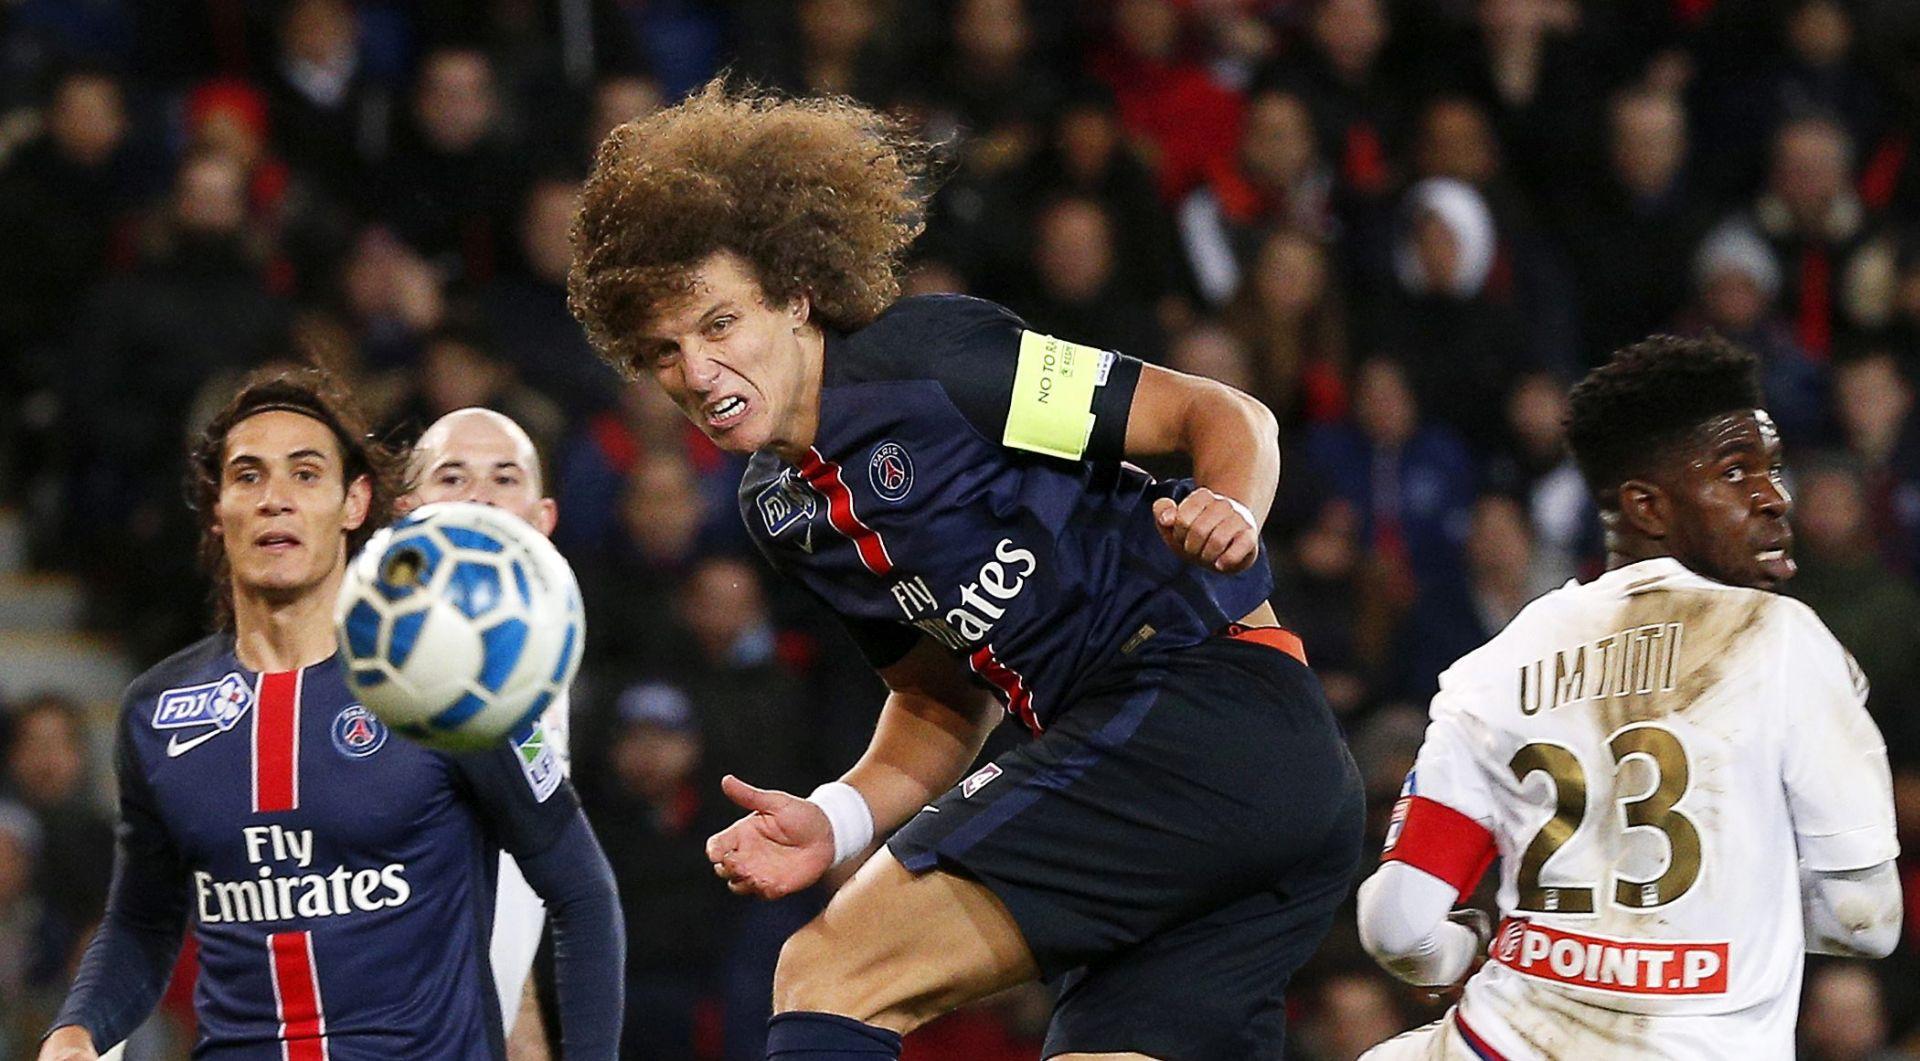 FRANCUSKI KUP U četvrtfinalima slavili PSG, Tolouse i Lille